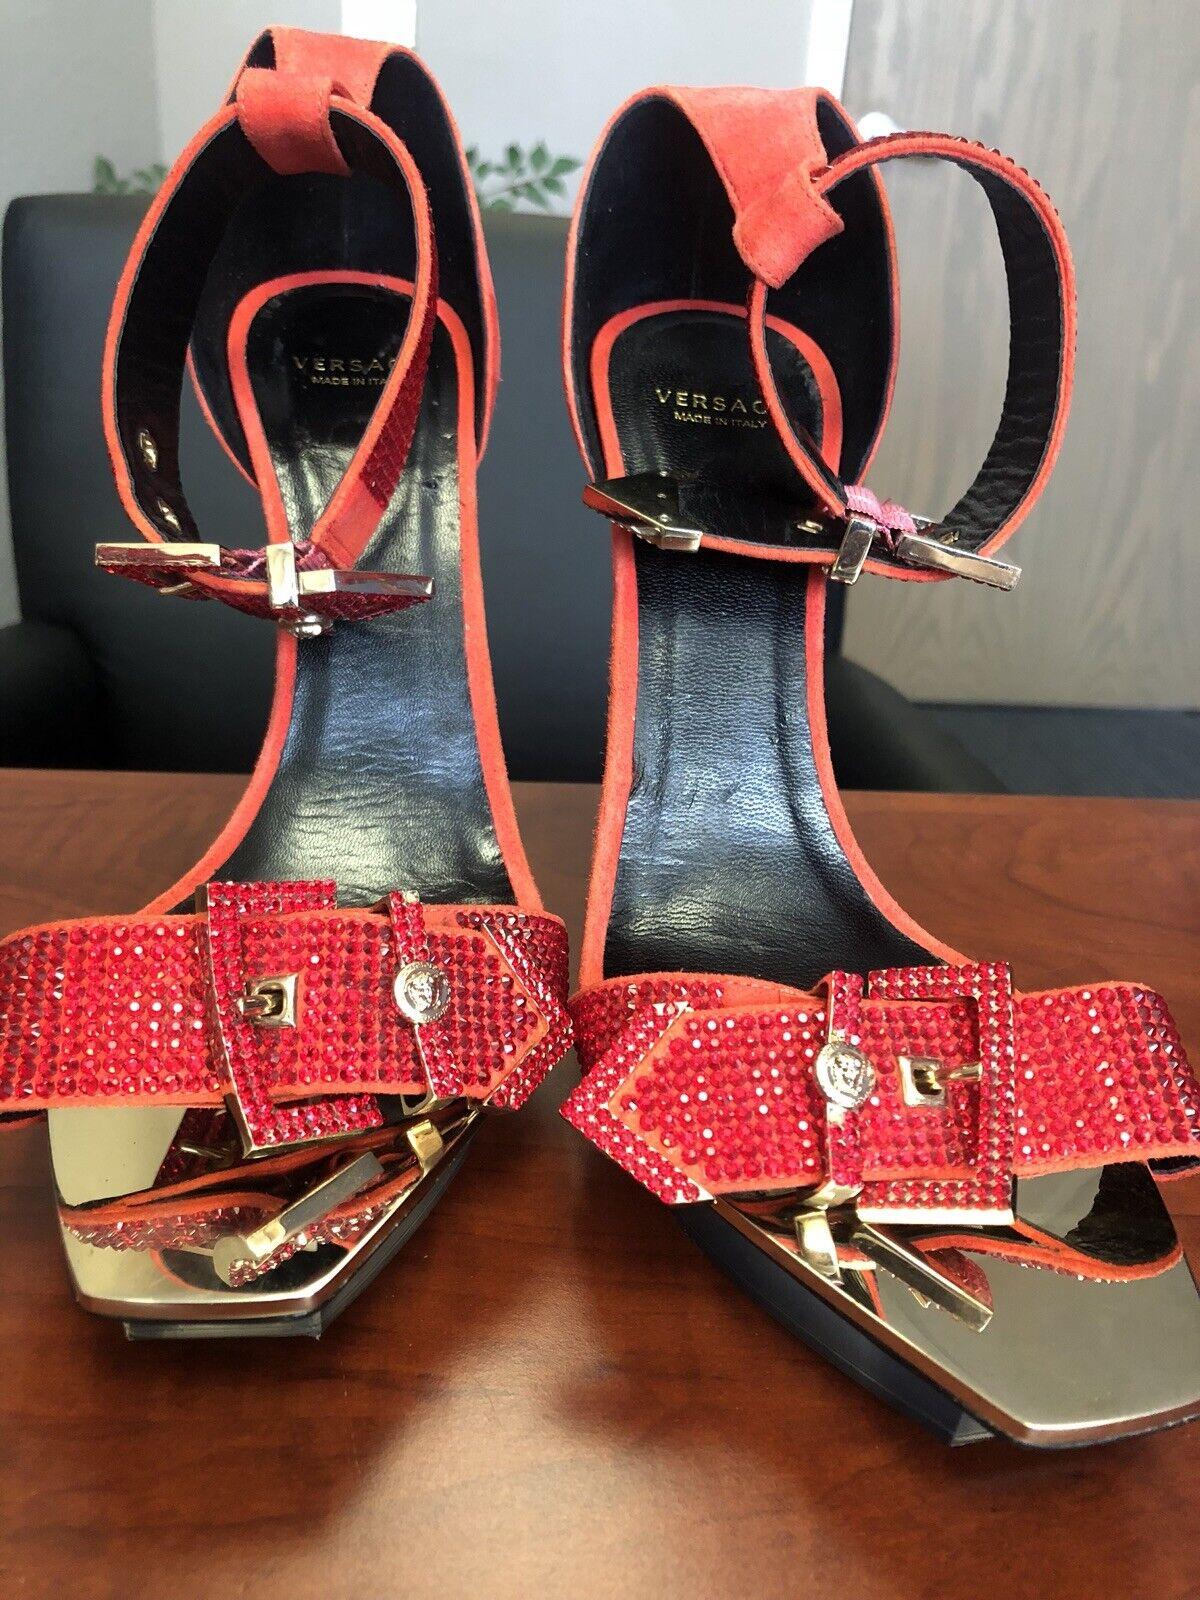 Versace Swaroski Swaroski Swaroski Crystal Platform Heels ae88d7